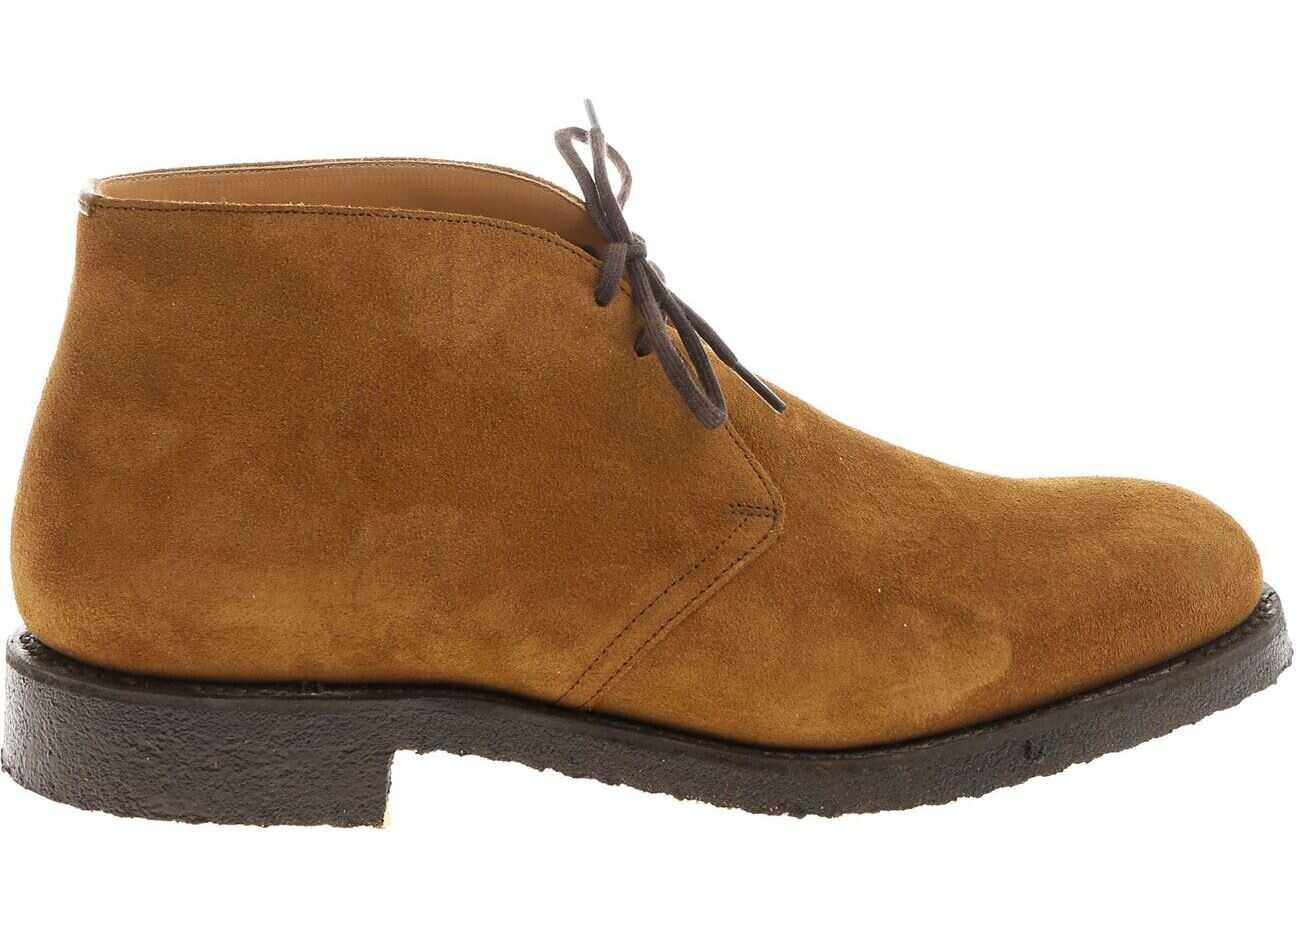 Church's Camel Desert Ryder Shoes ETC002 9VE F0AAY Camel imagine b-mall.ro